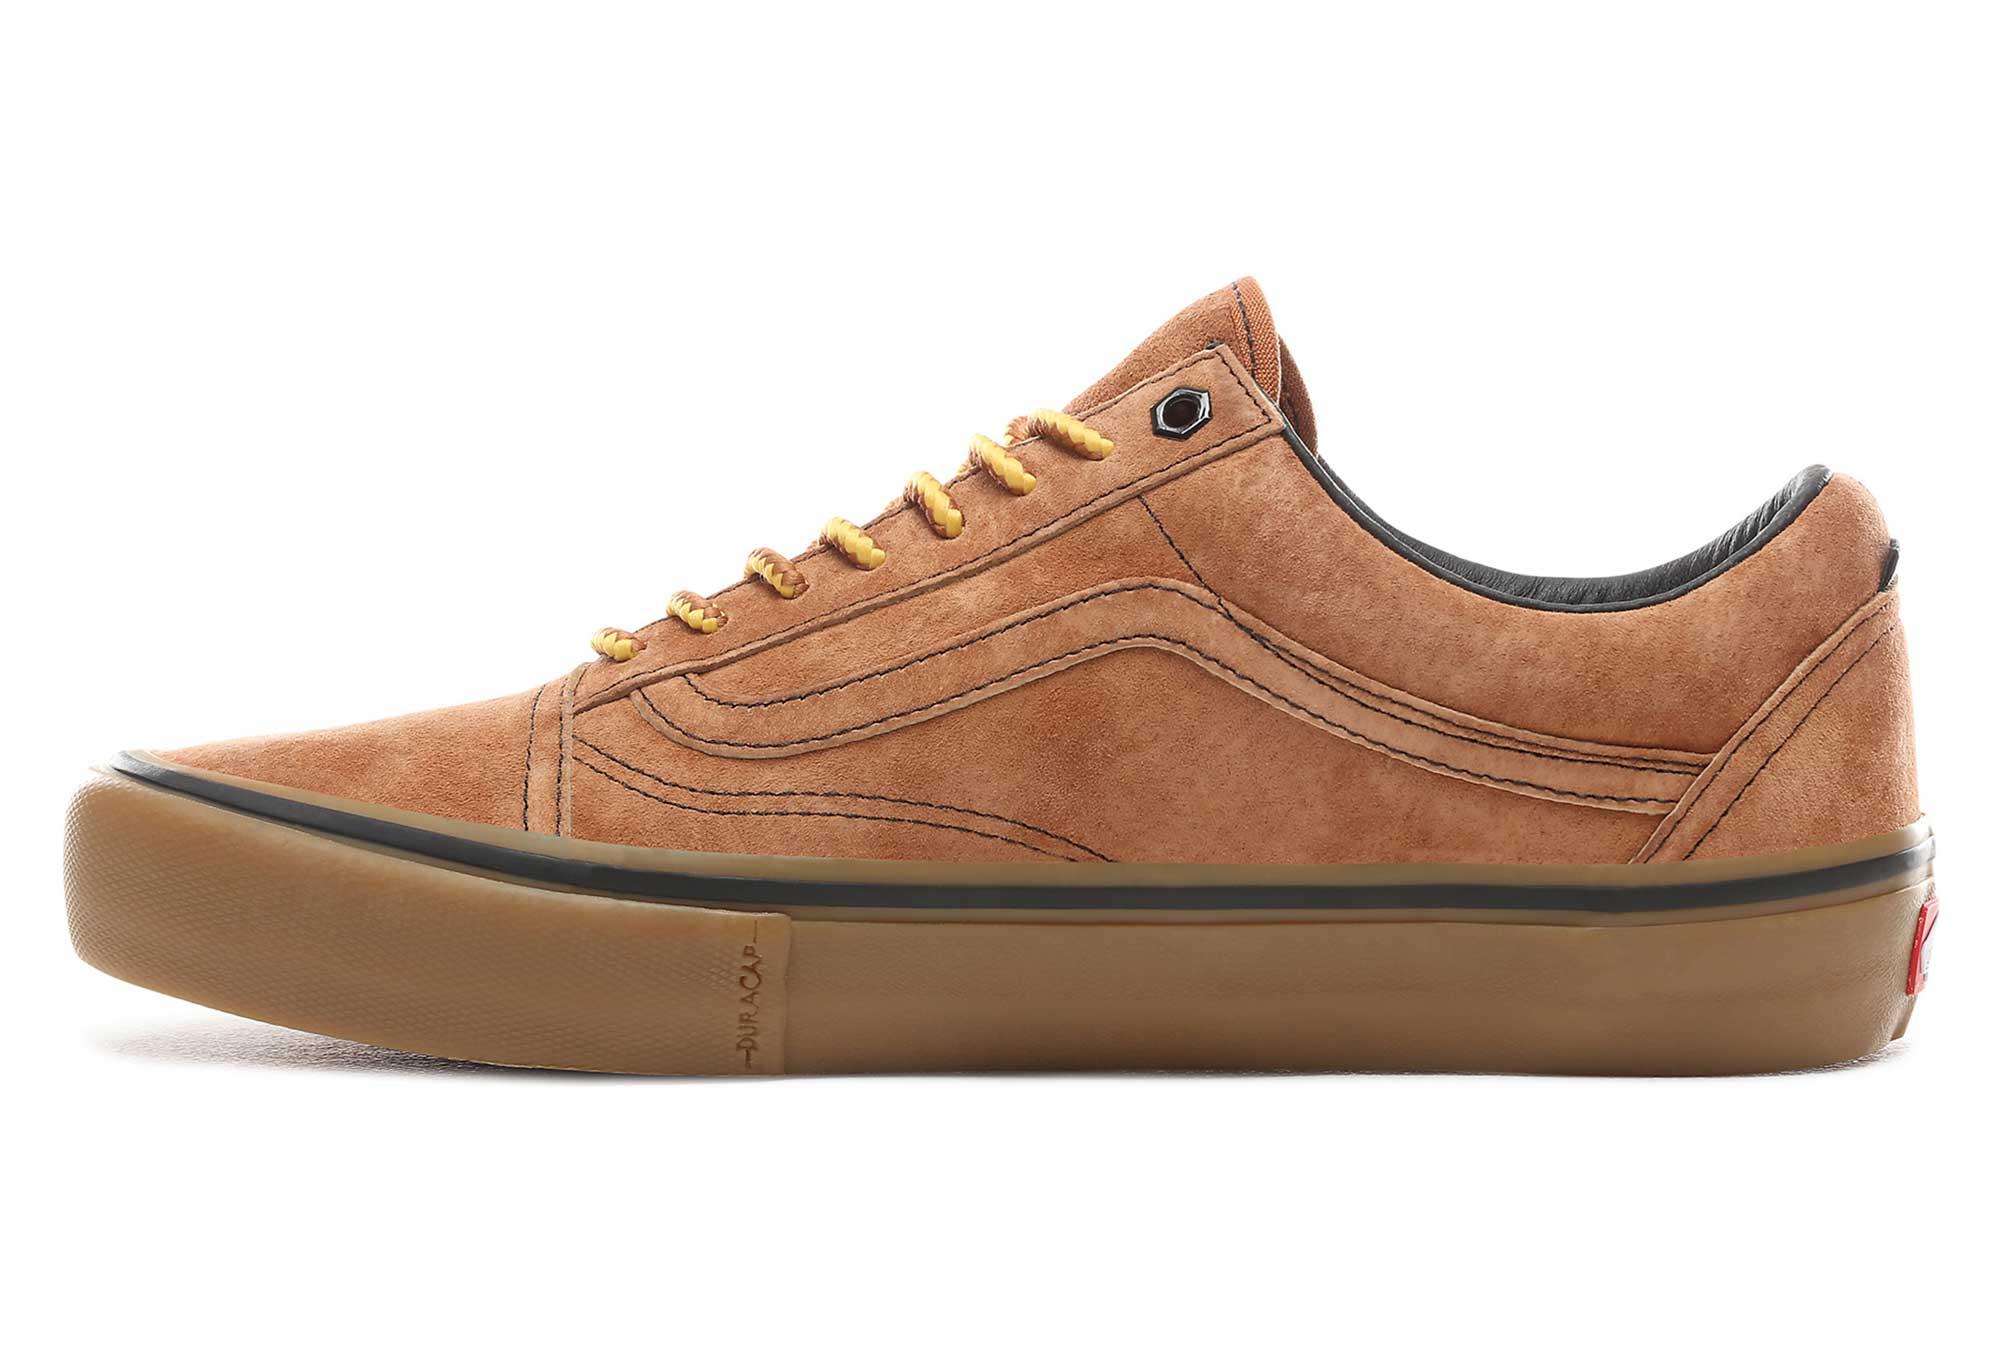 Chaussures Vans Old Skool Pro Anti Hero Marron